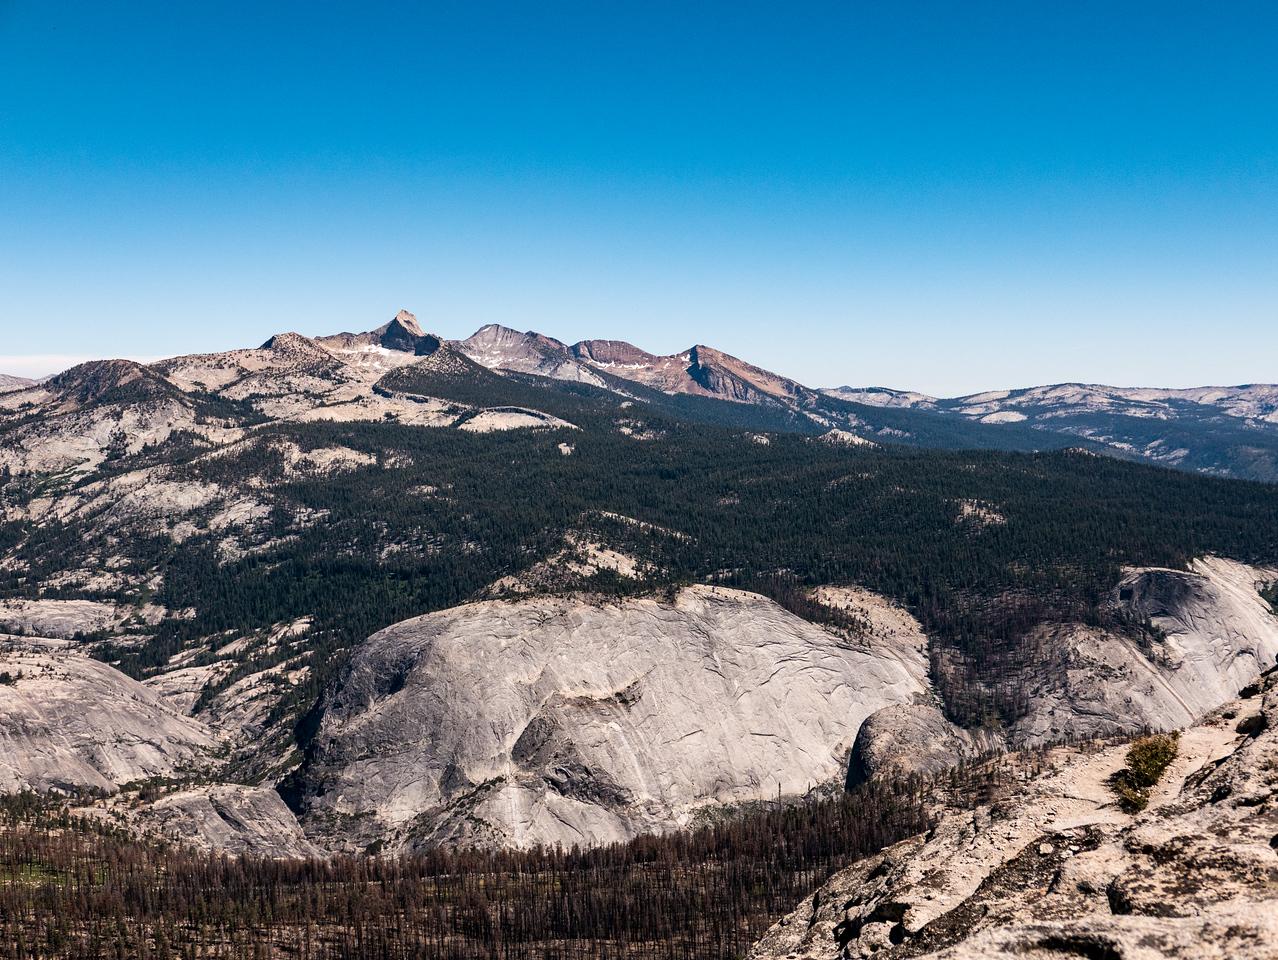 Mt Clark and the Clark Range